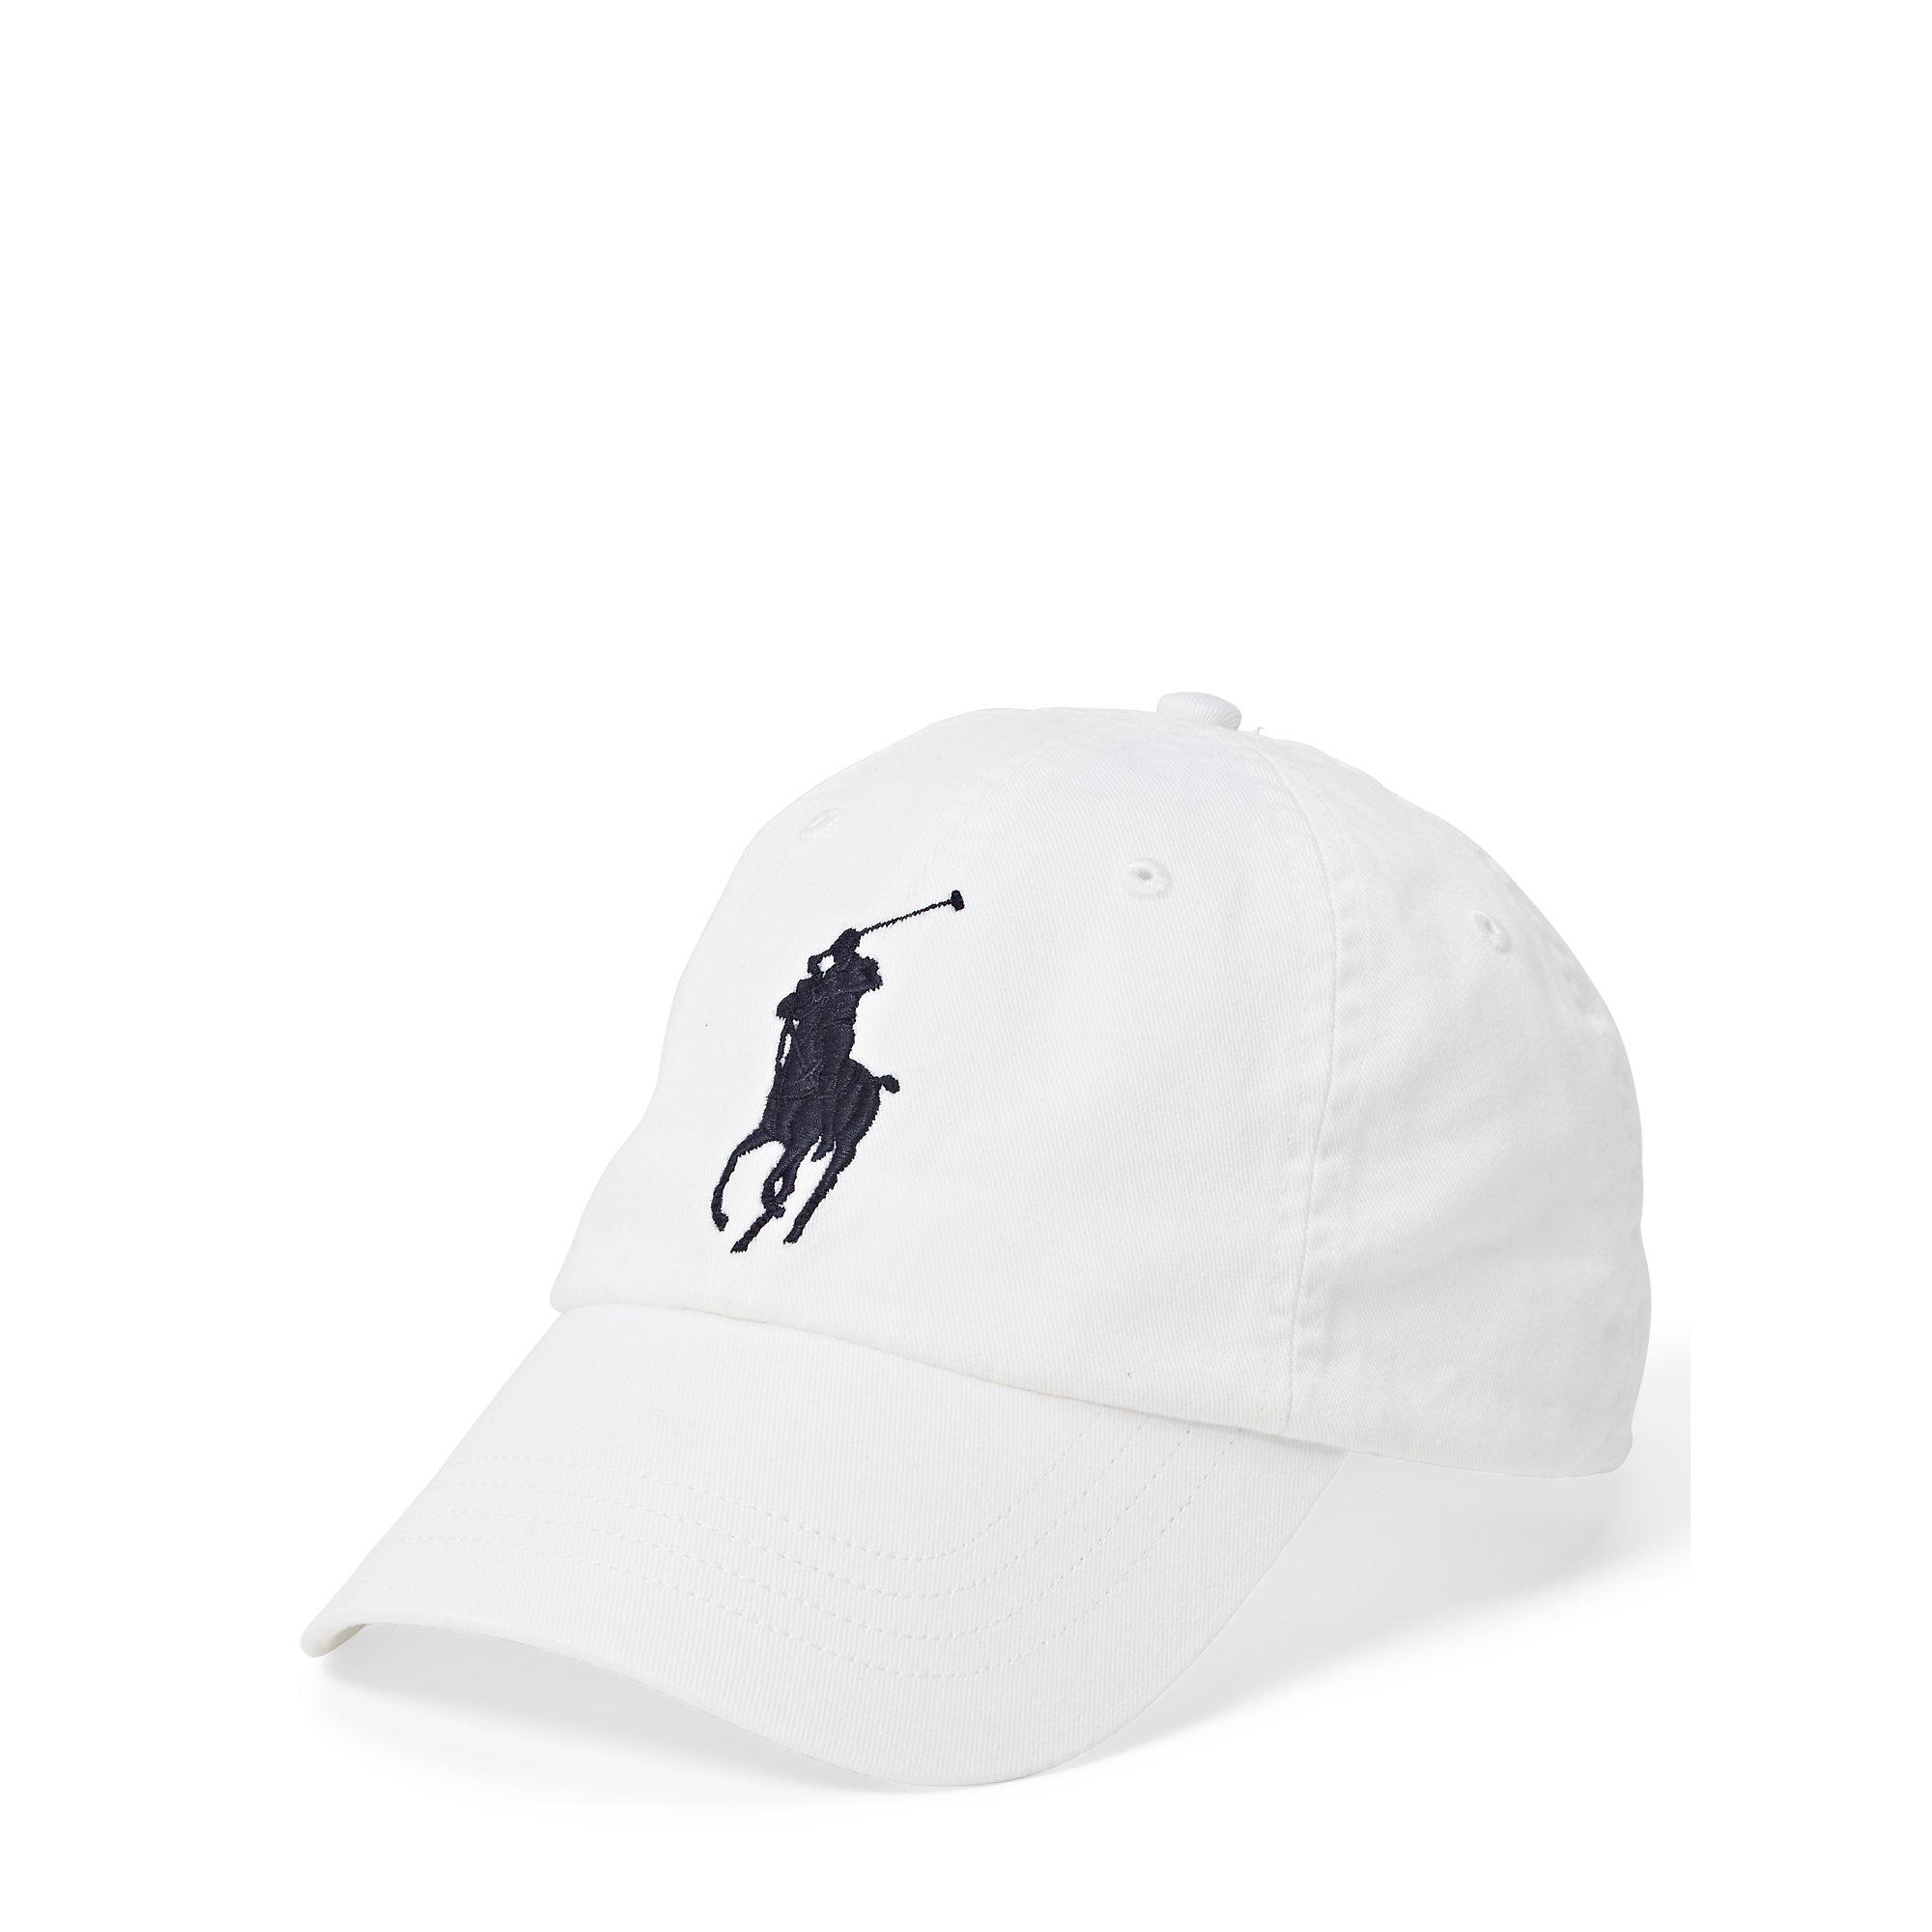 polo ralph lauren cotton chino sport cap in white for men. Black Bedroom Furniture Sets. Home Design Ideas